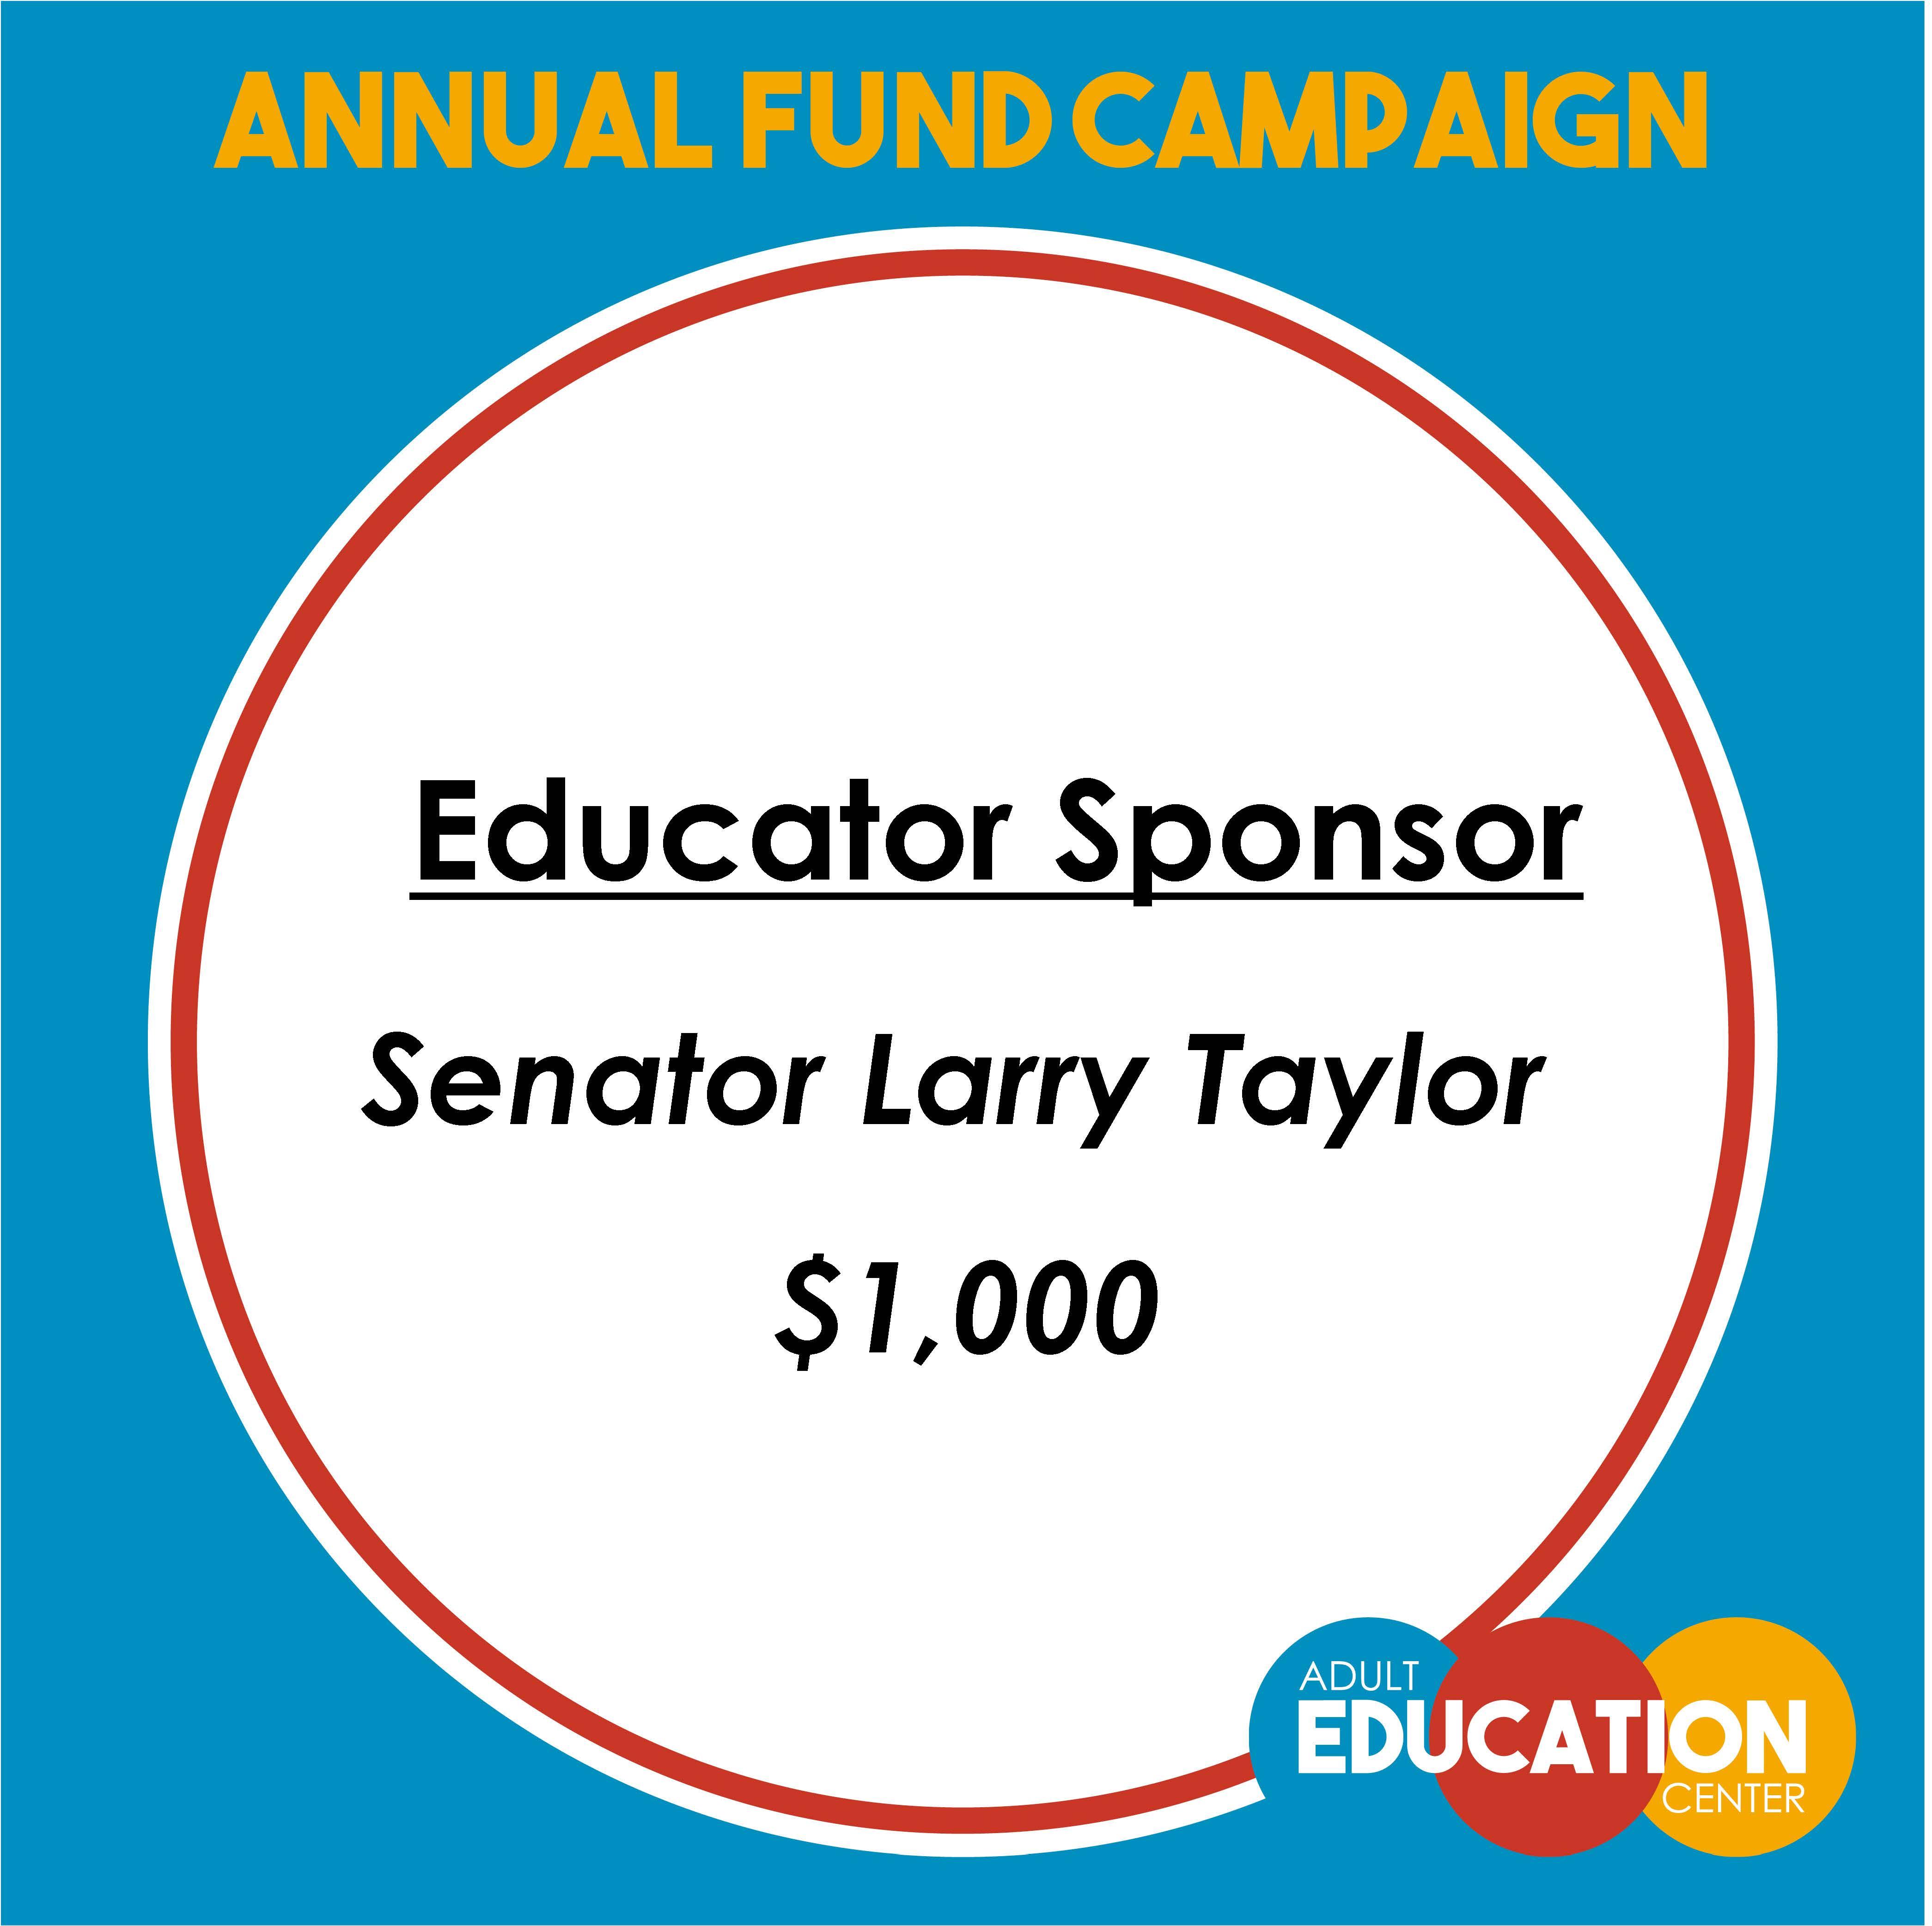 Senator Larry Taylor - Educator Sponsor - $1,000